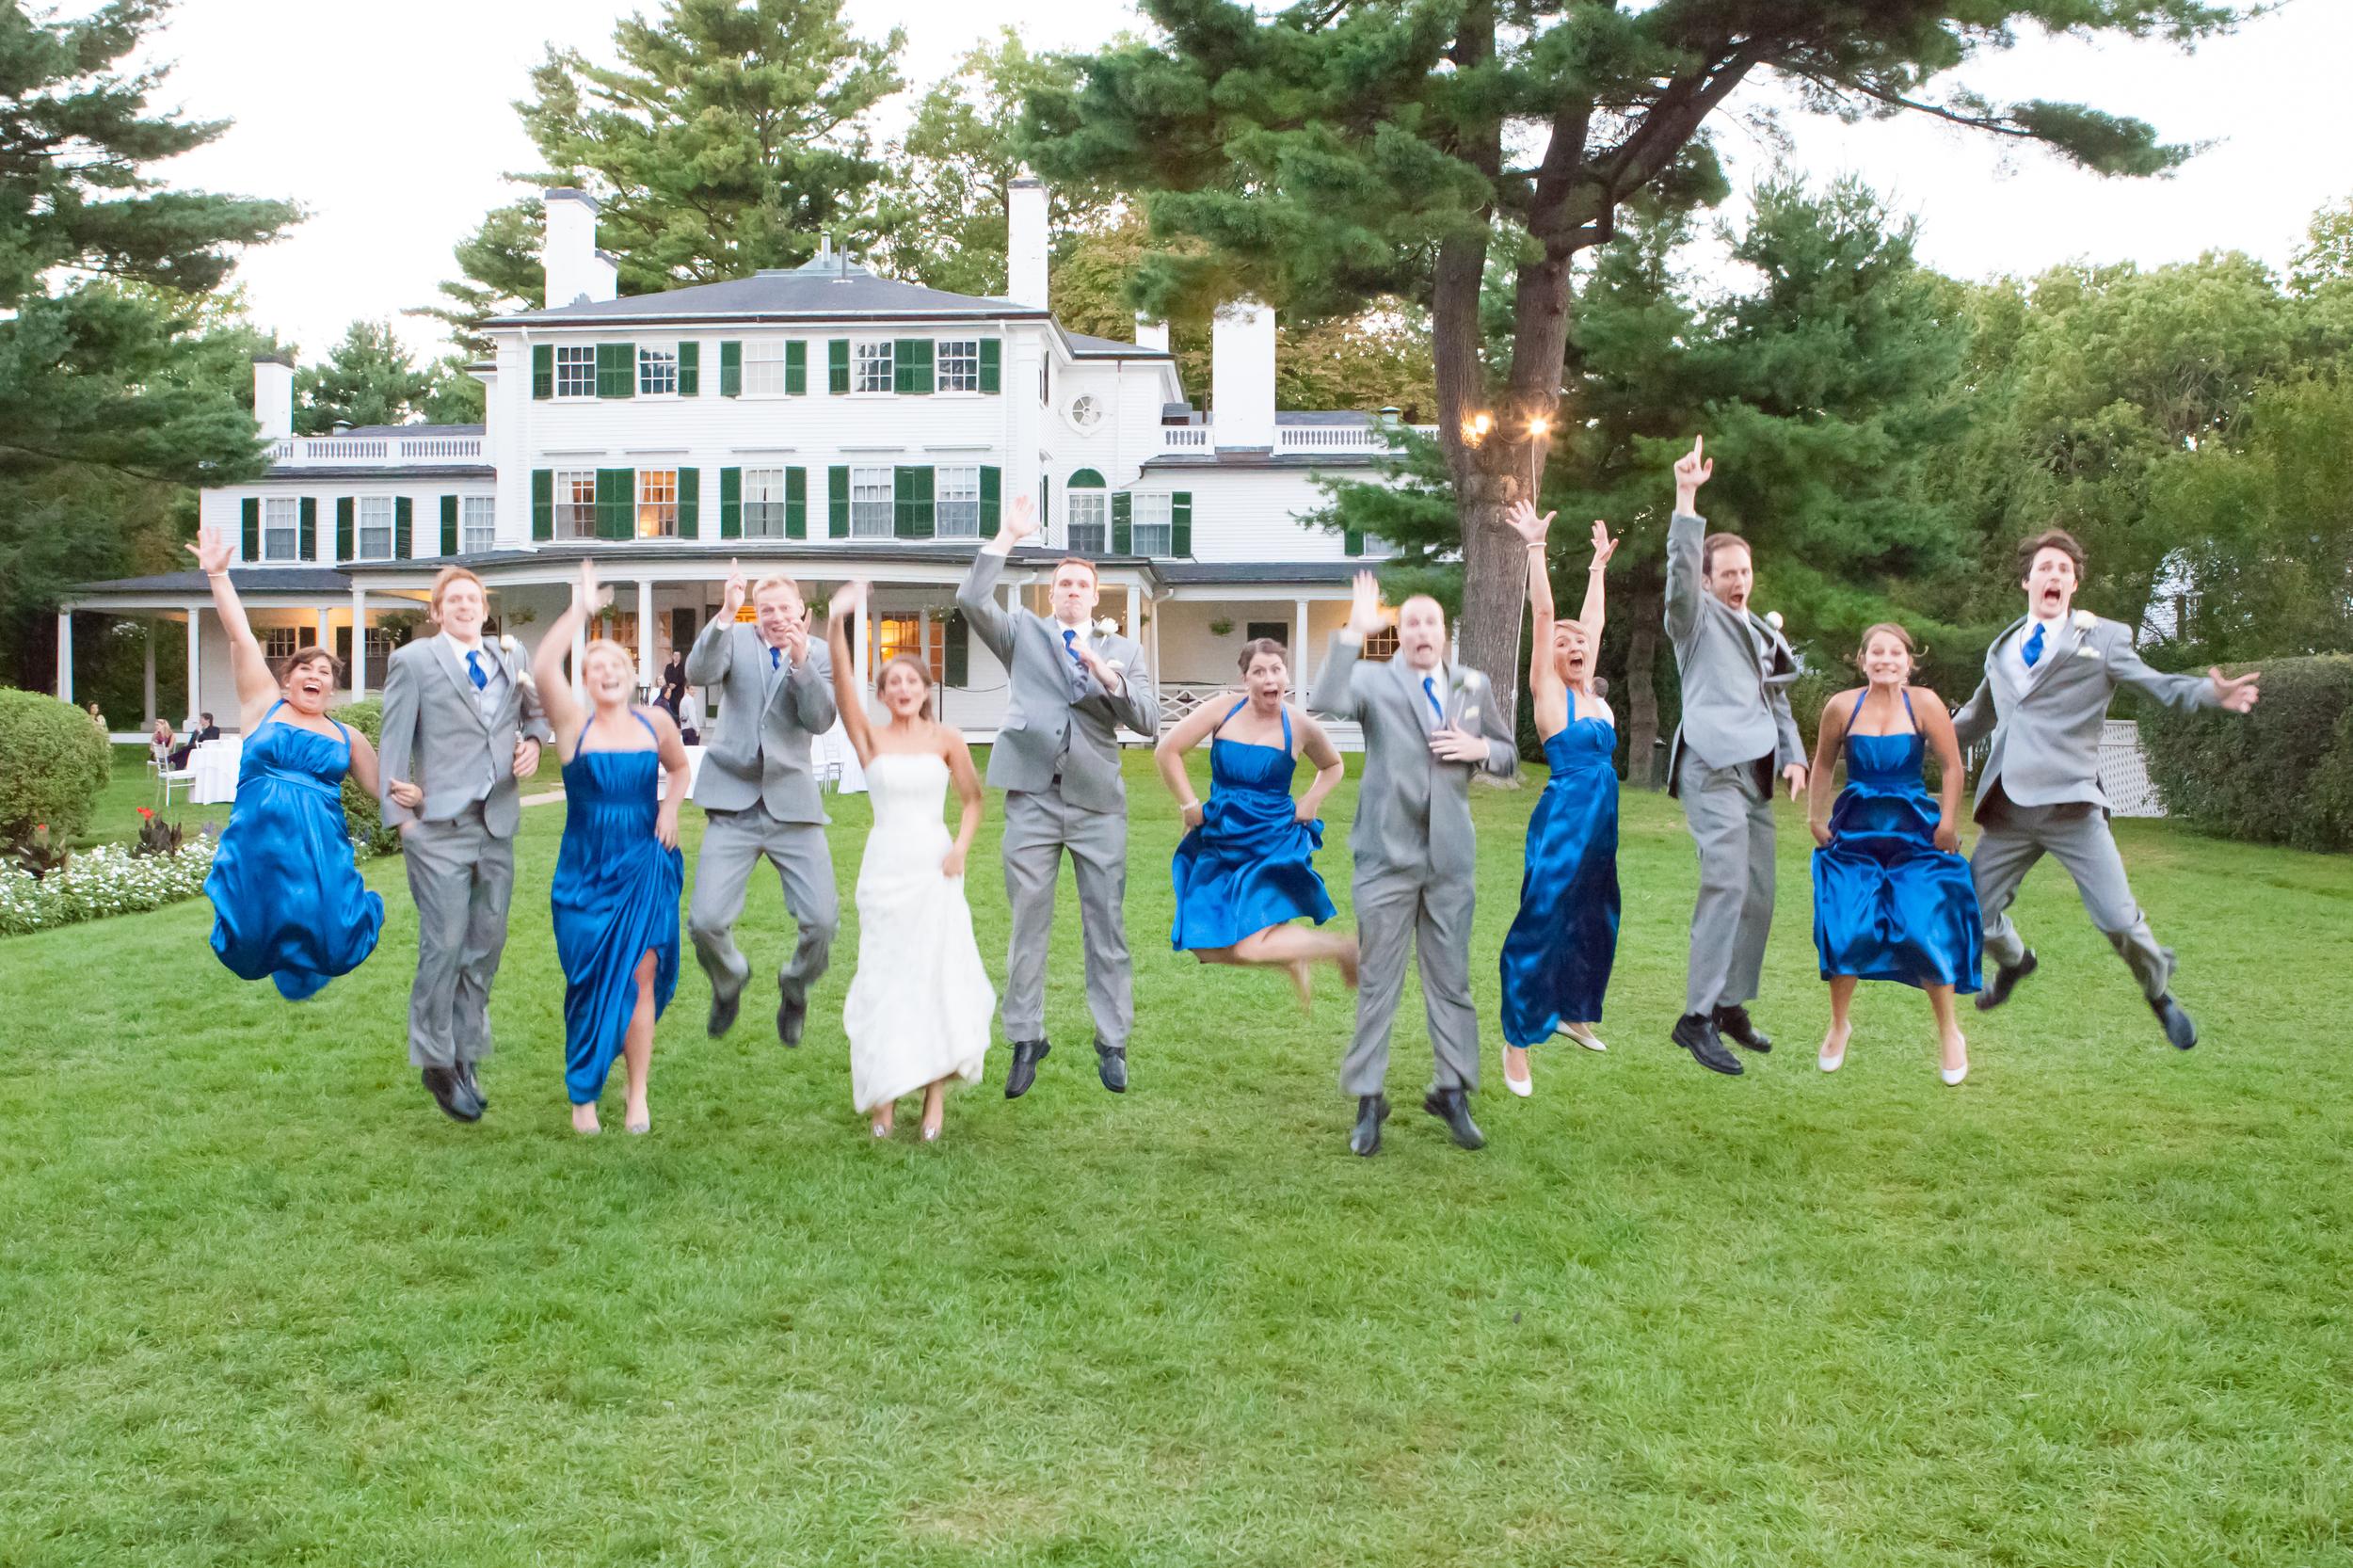 glan magna wedding jumping .jpg